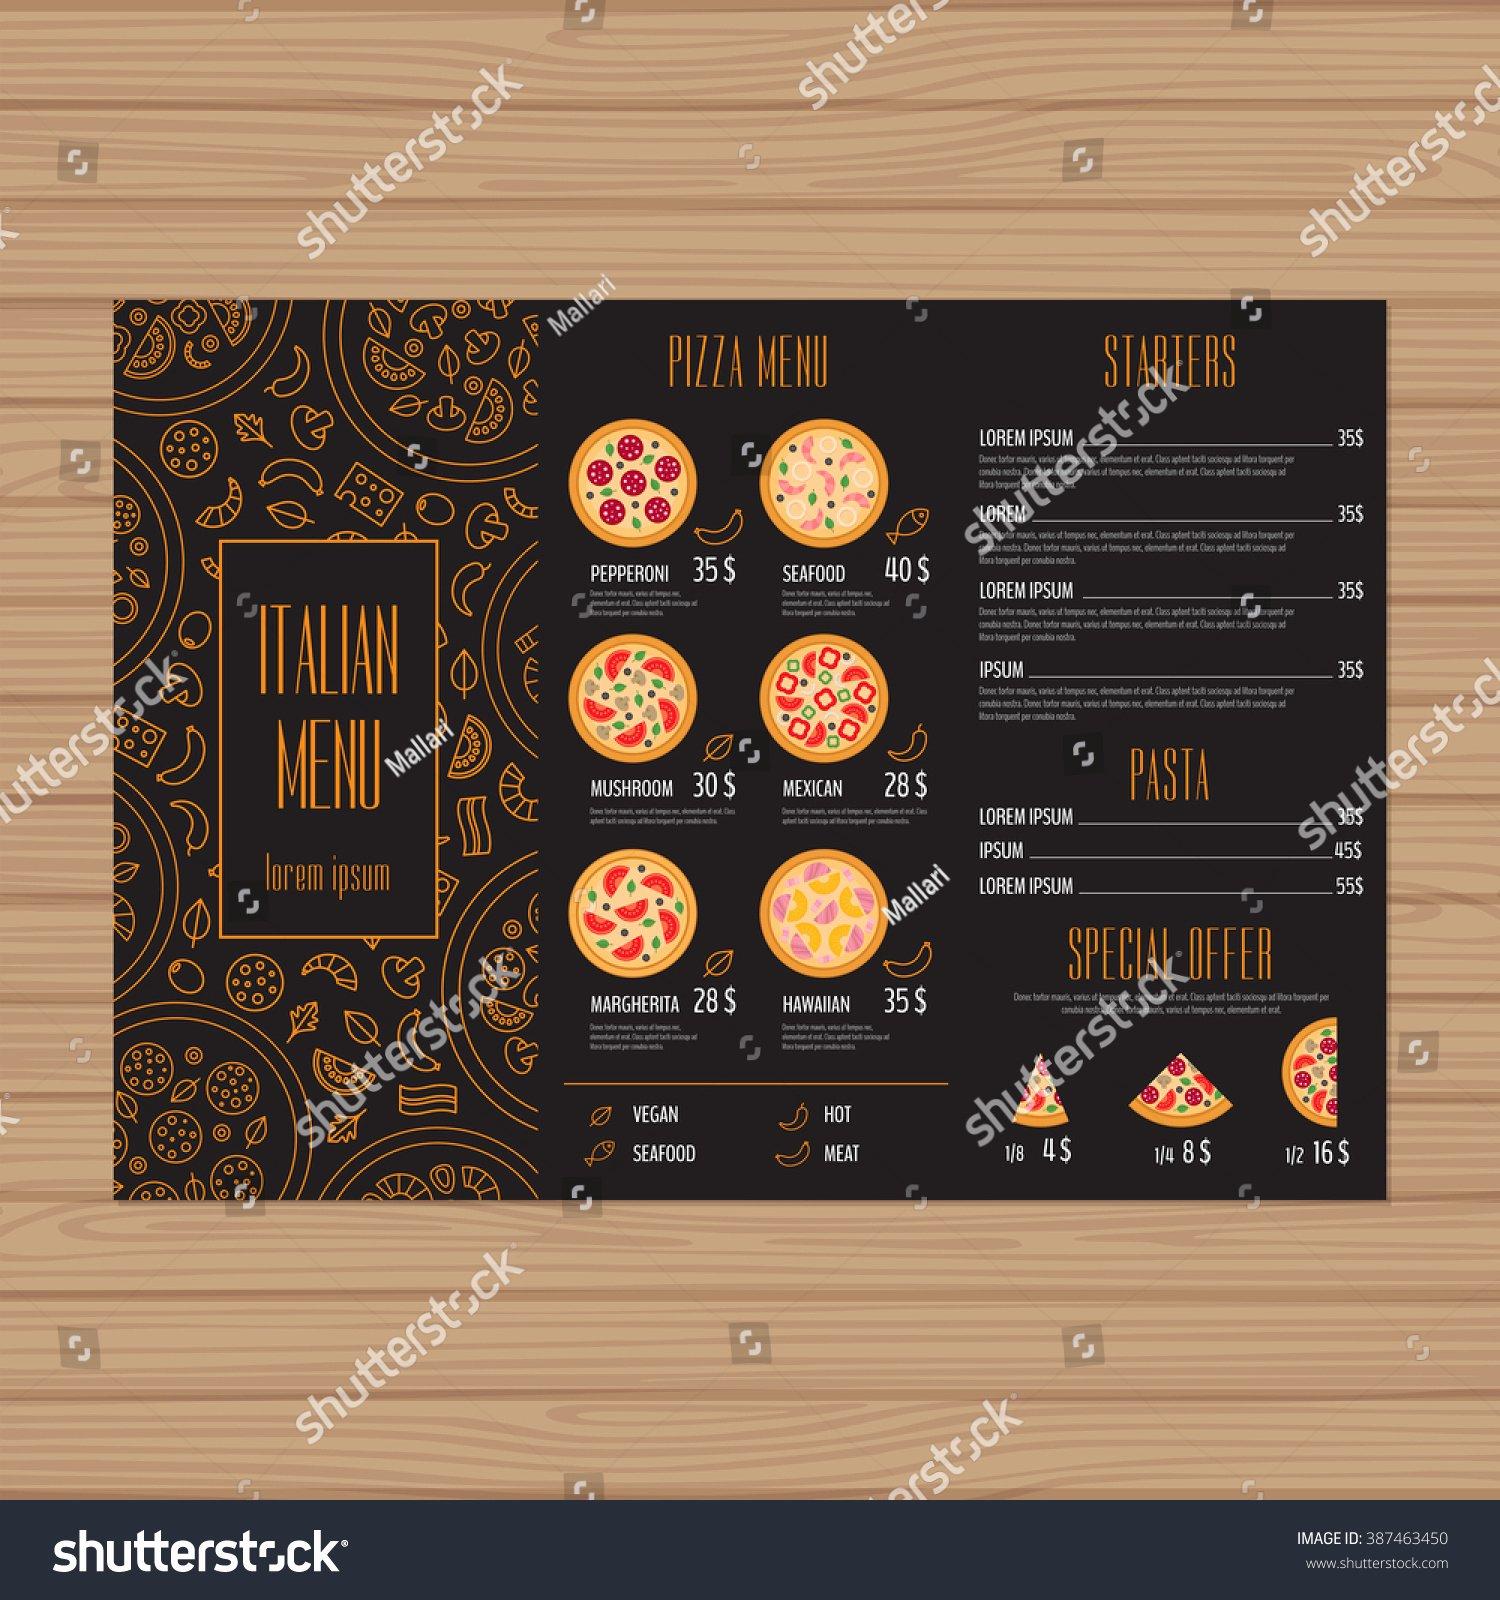 Pizza Menu Design Trifold Leaflet Layout Stock Vector